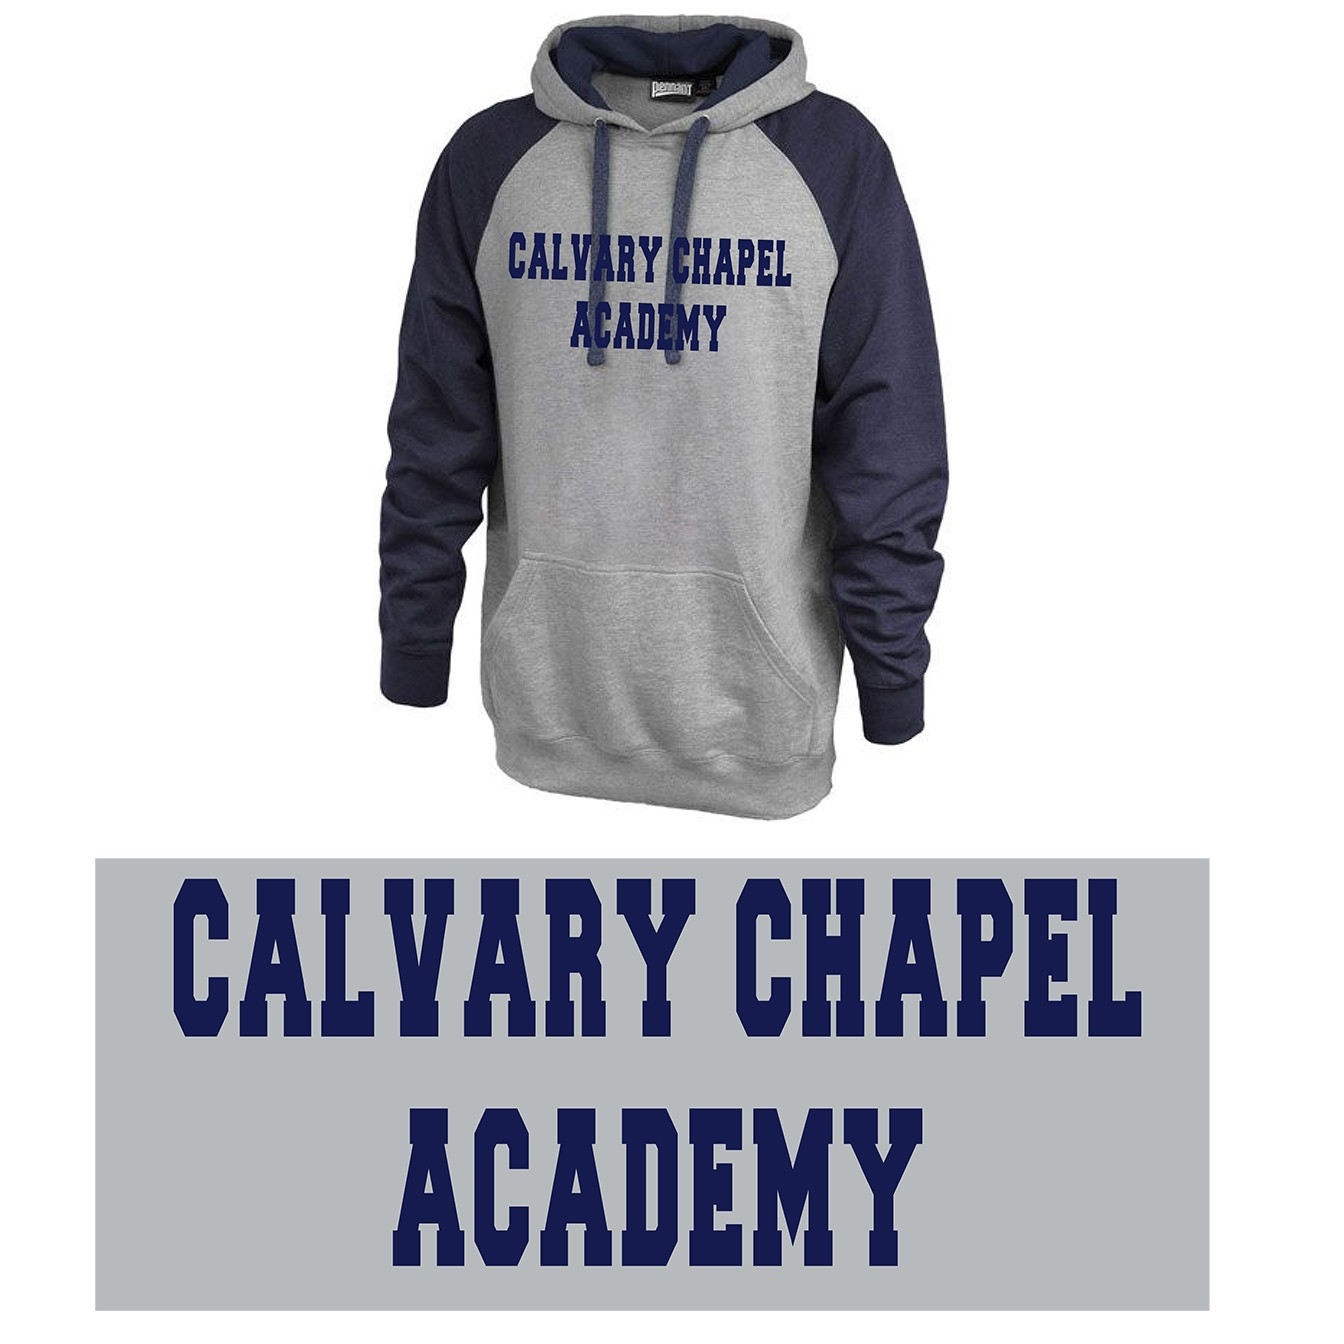 Calvary Chapel Academy Pennant Sportswear Vintage Grey & Navy Hoodie, Adult Sizing